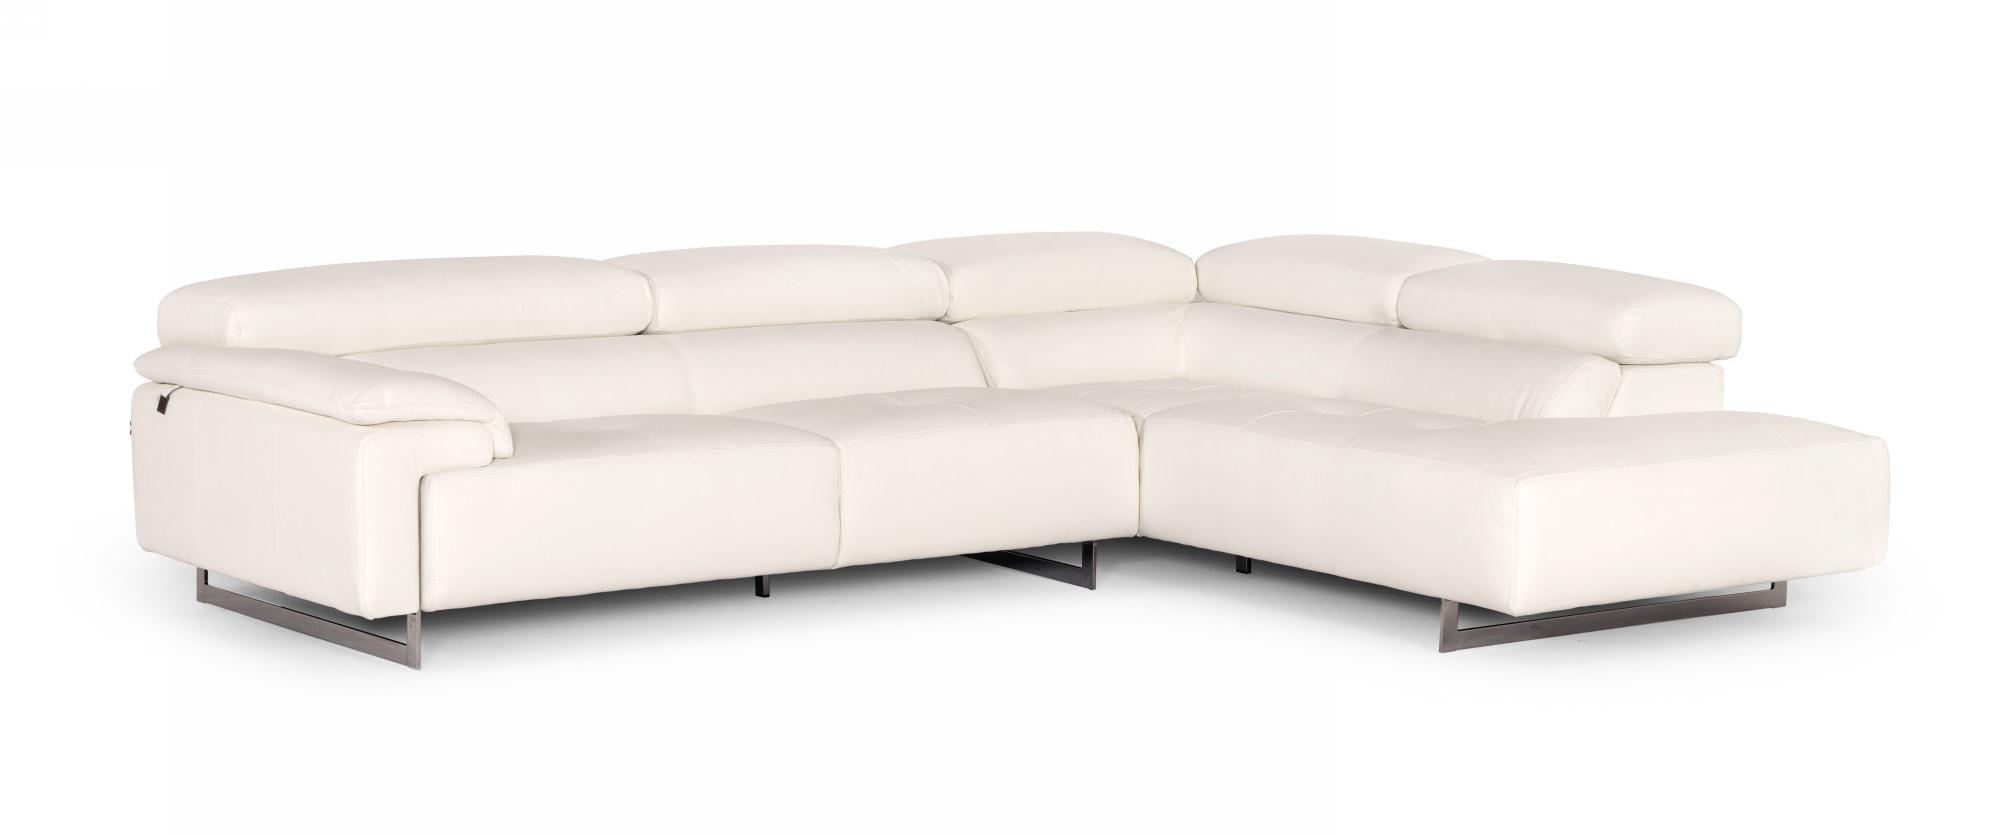 VIG Furniture Estro Salotti Wish Modern White Leather Sectional Sofa